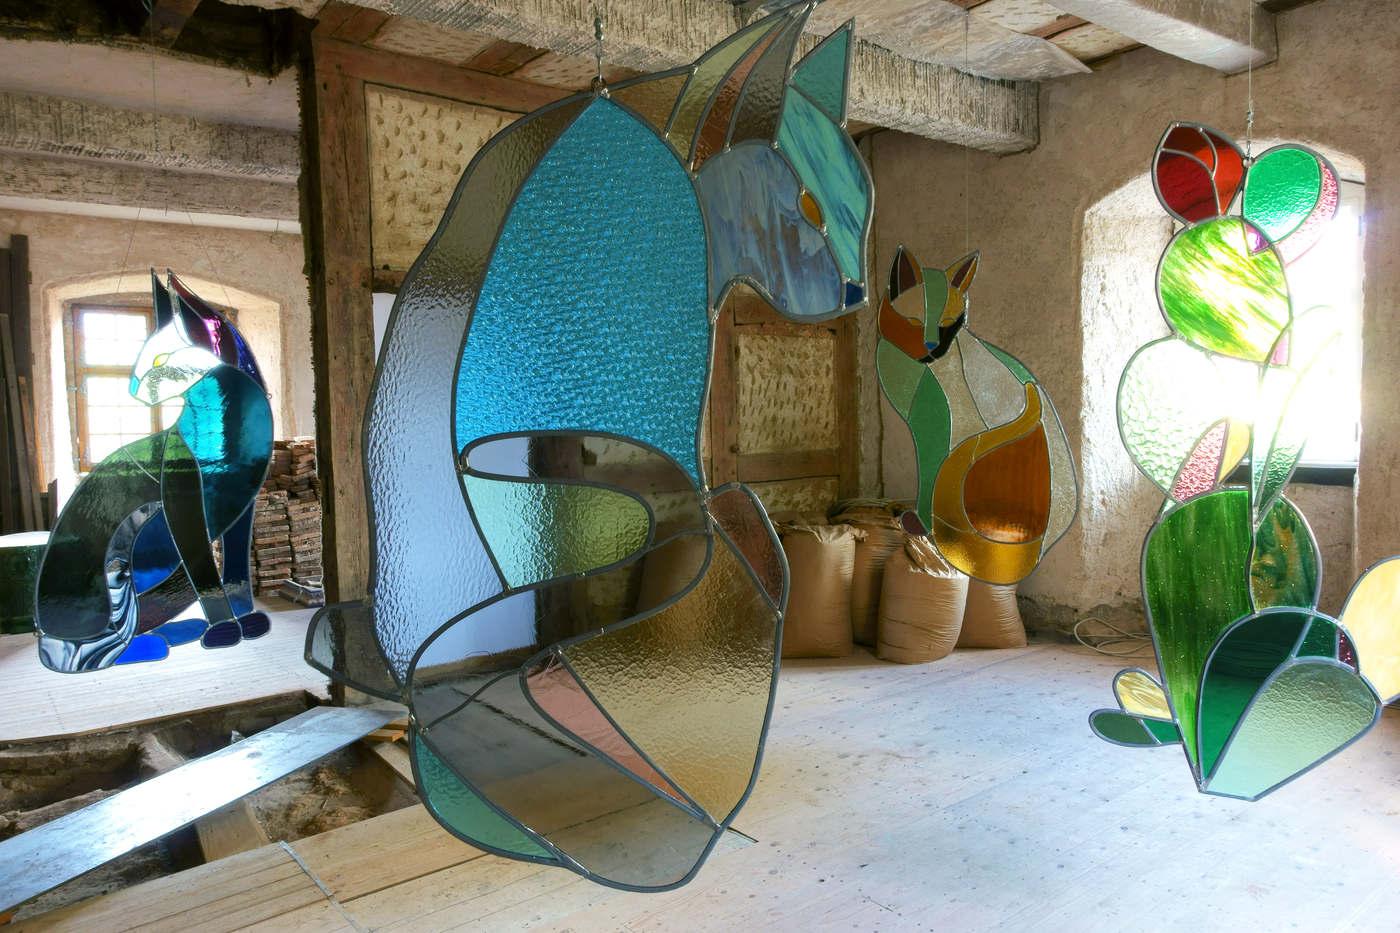 Kunstverein Wiesen_KuWi_Forward to History_Jan Kiefer & Robert Brambora_2016_JK_Room2_a